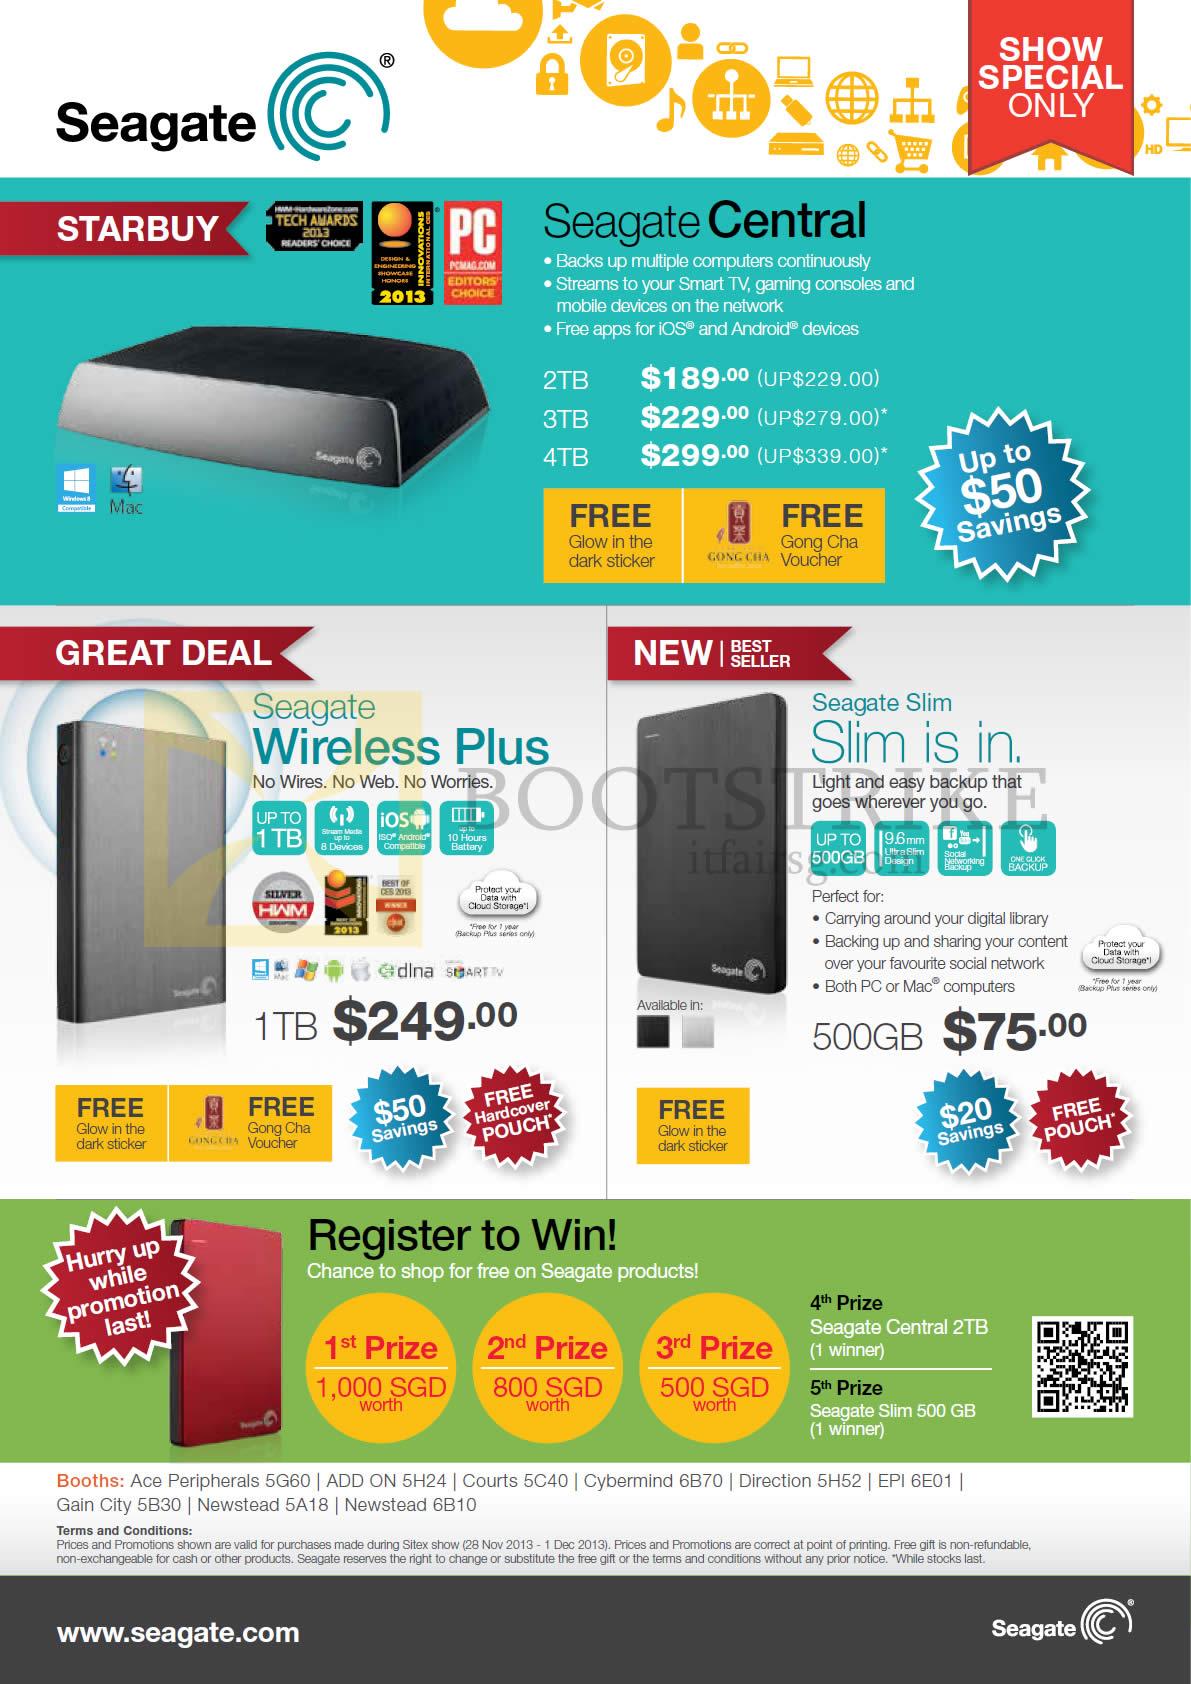 SITEX 2013 price list image brochure of Seagate External Storage Central 2TB 3TB 4TB, Wireless Plus 1TB, Slim 500GB